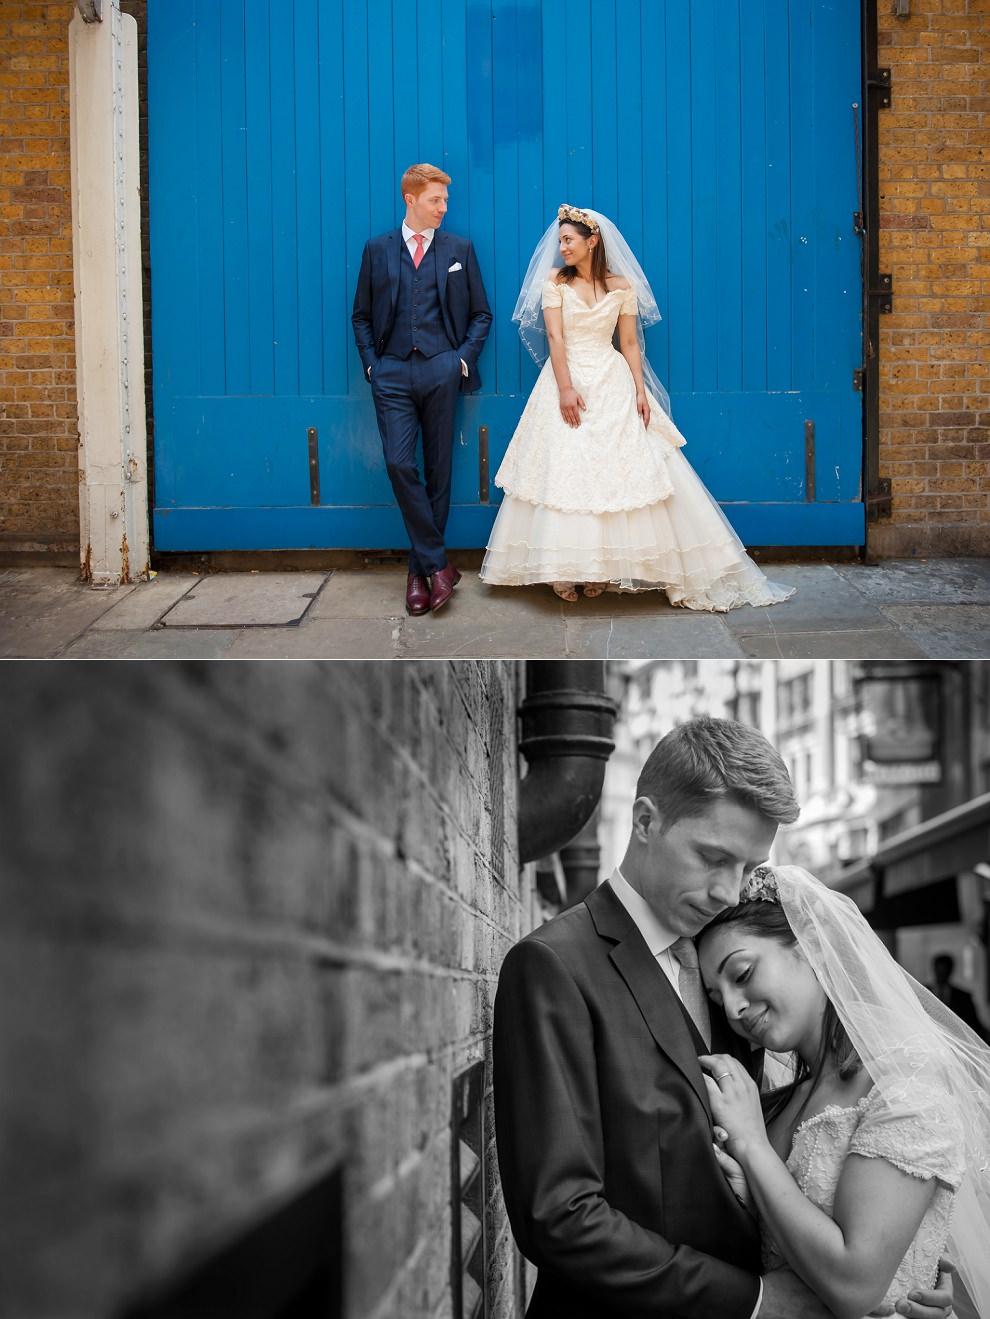 Best-wedding-photos-UK-2015-120